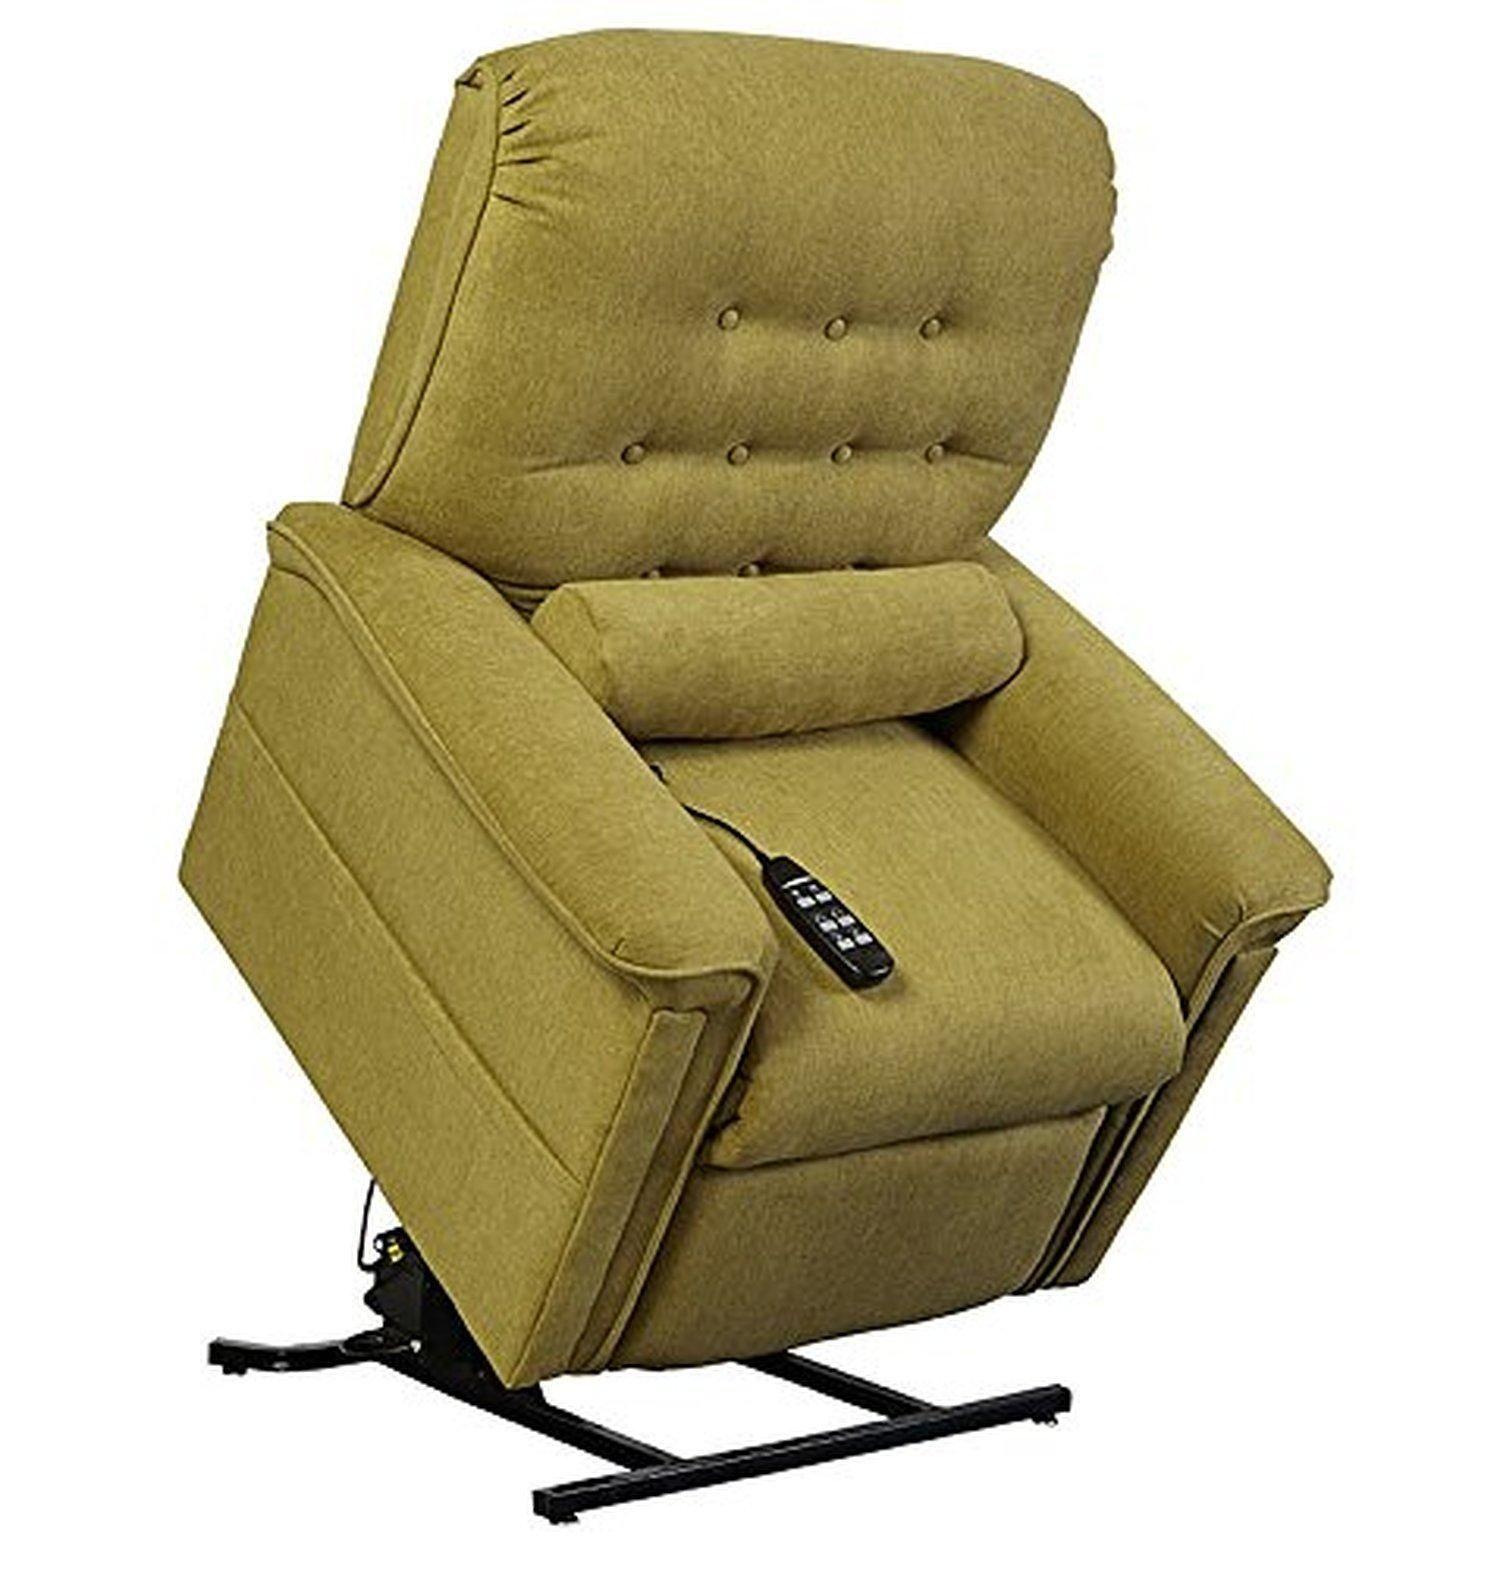 Windermere Hudson Nm1550 Power Electric Lift Chair Infinite